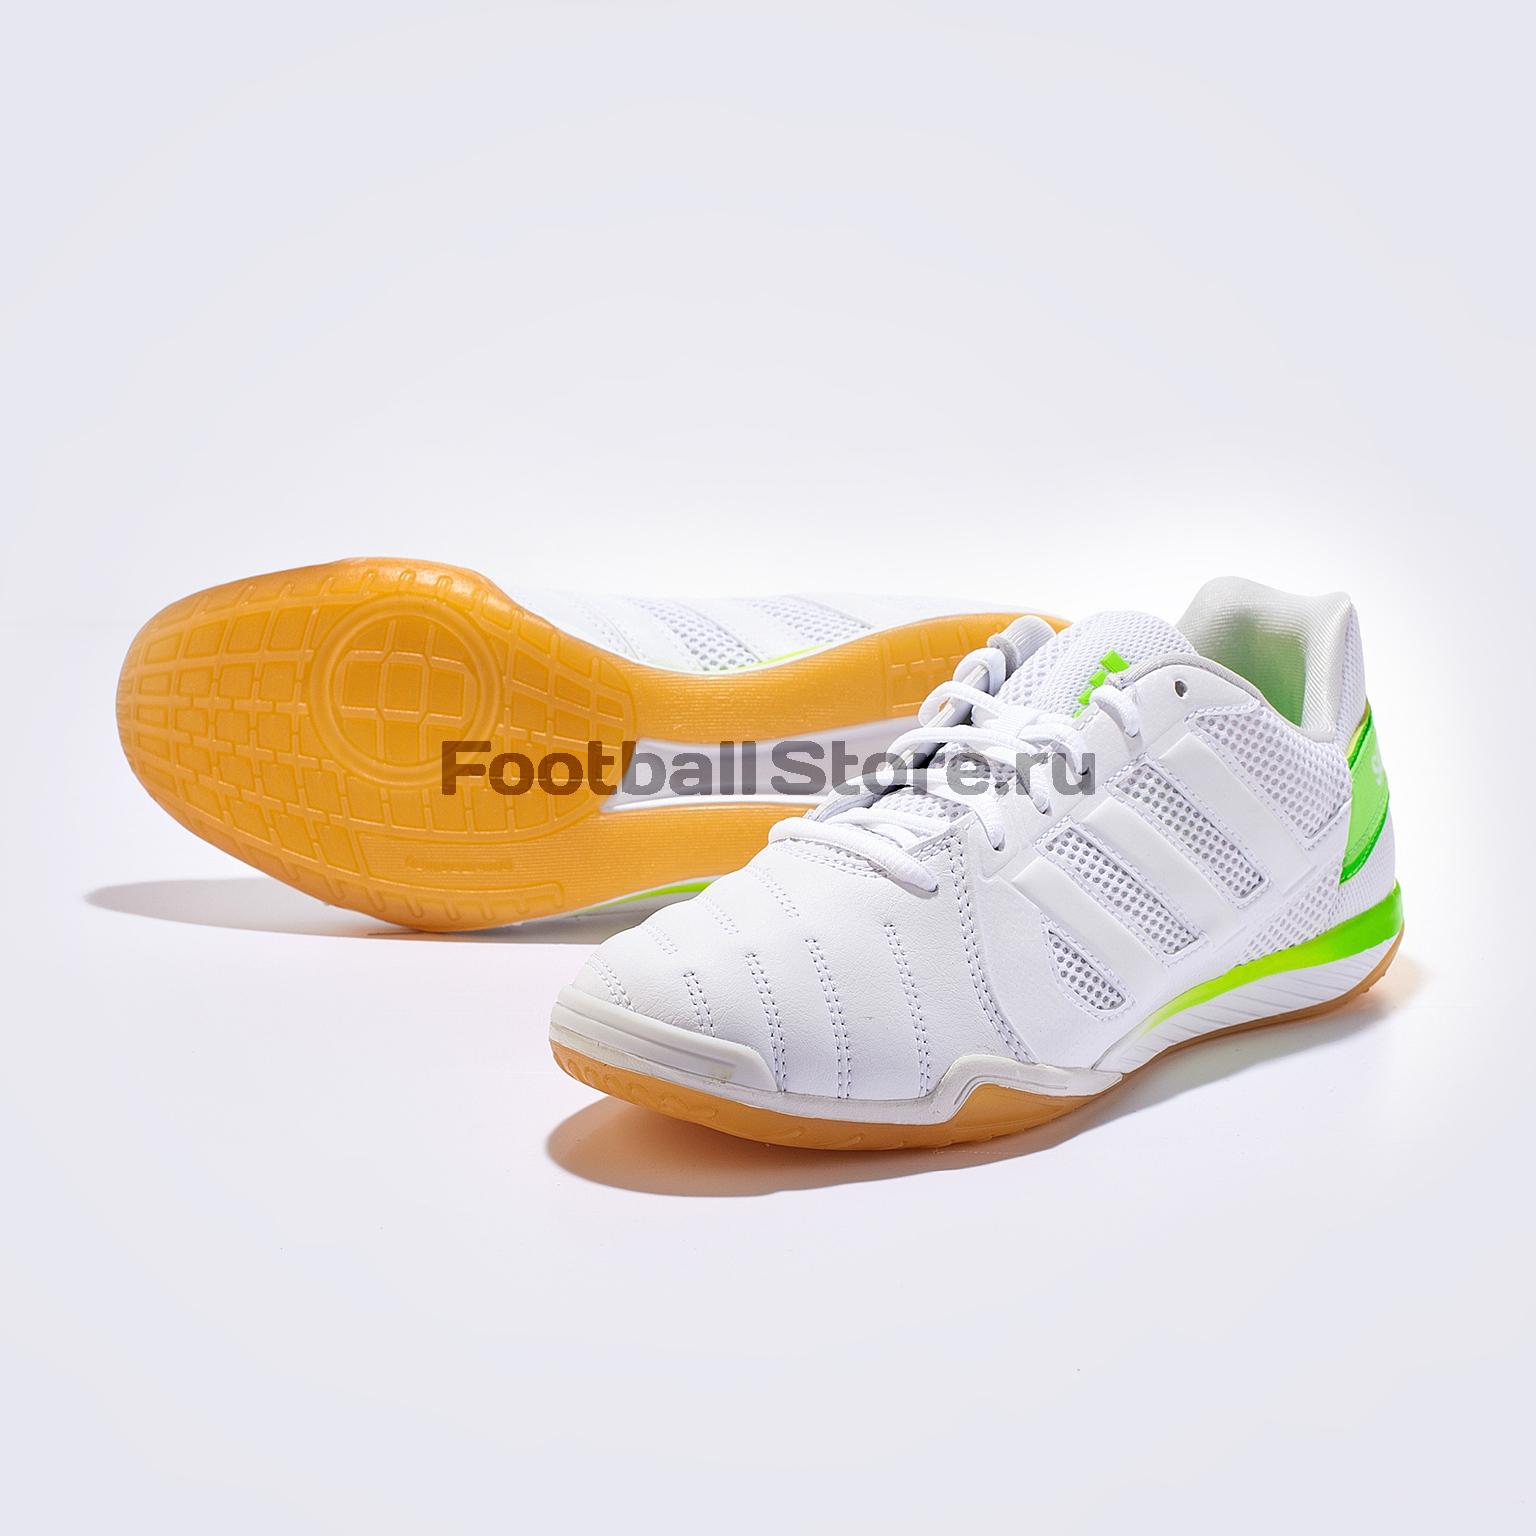 Футзалки Adidas Top Sala FV2558